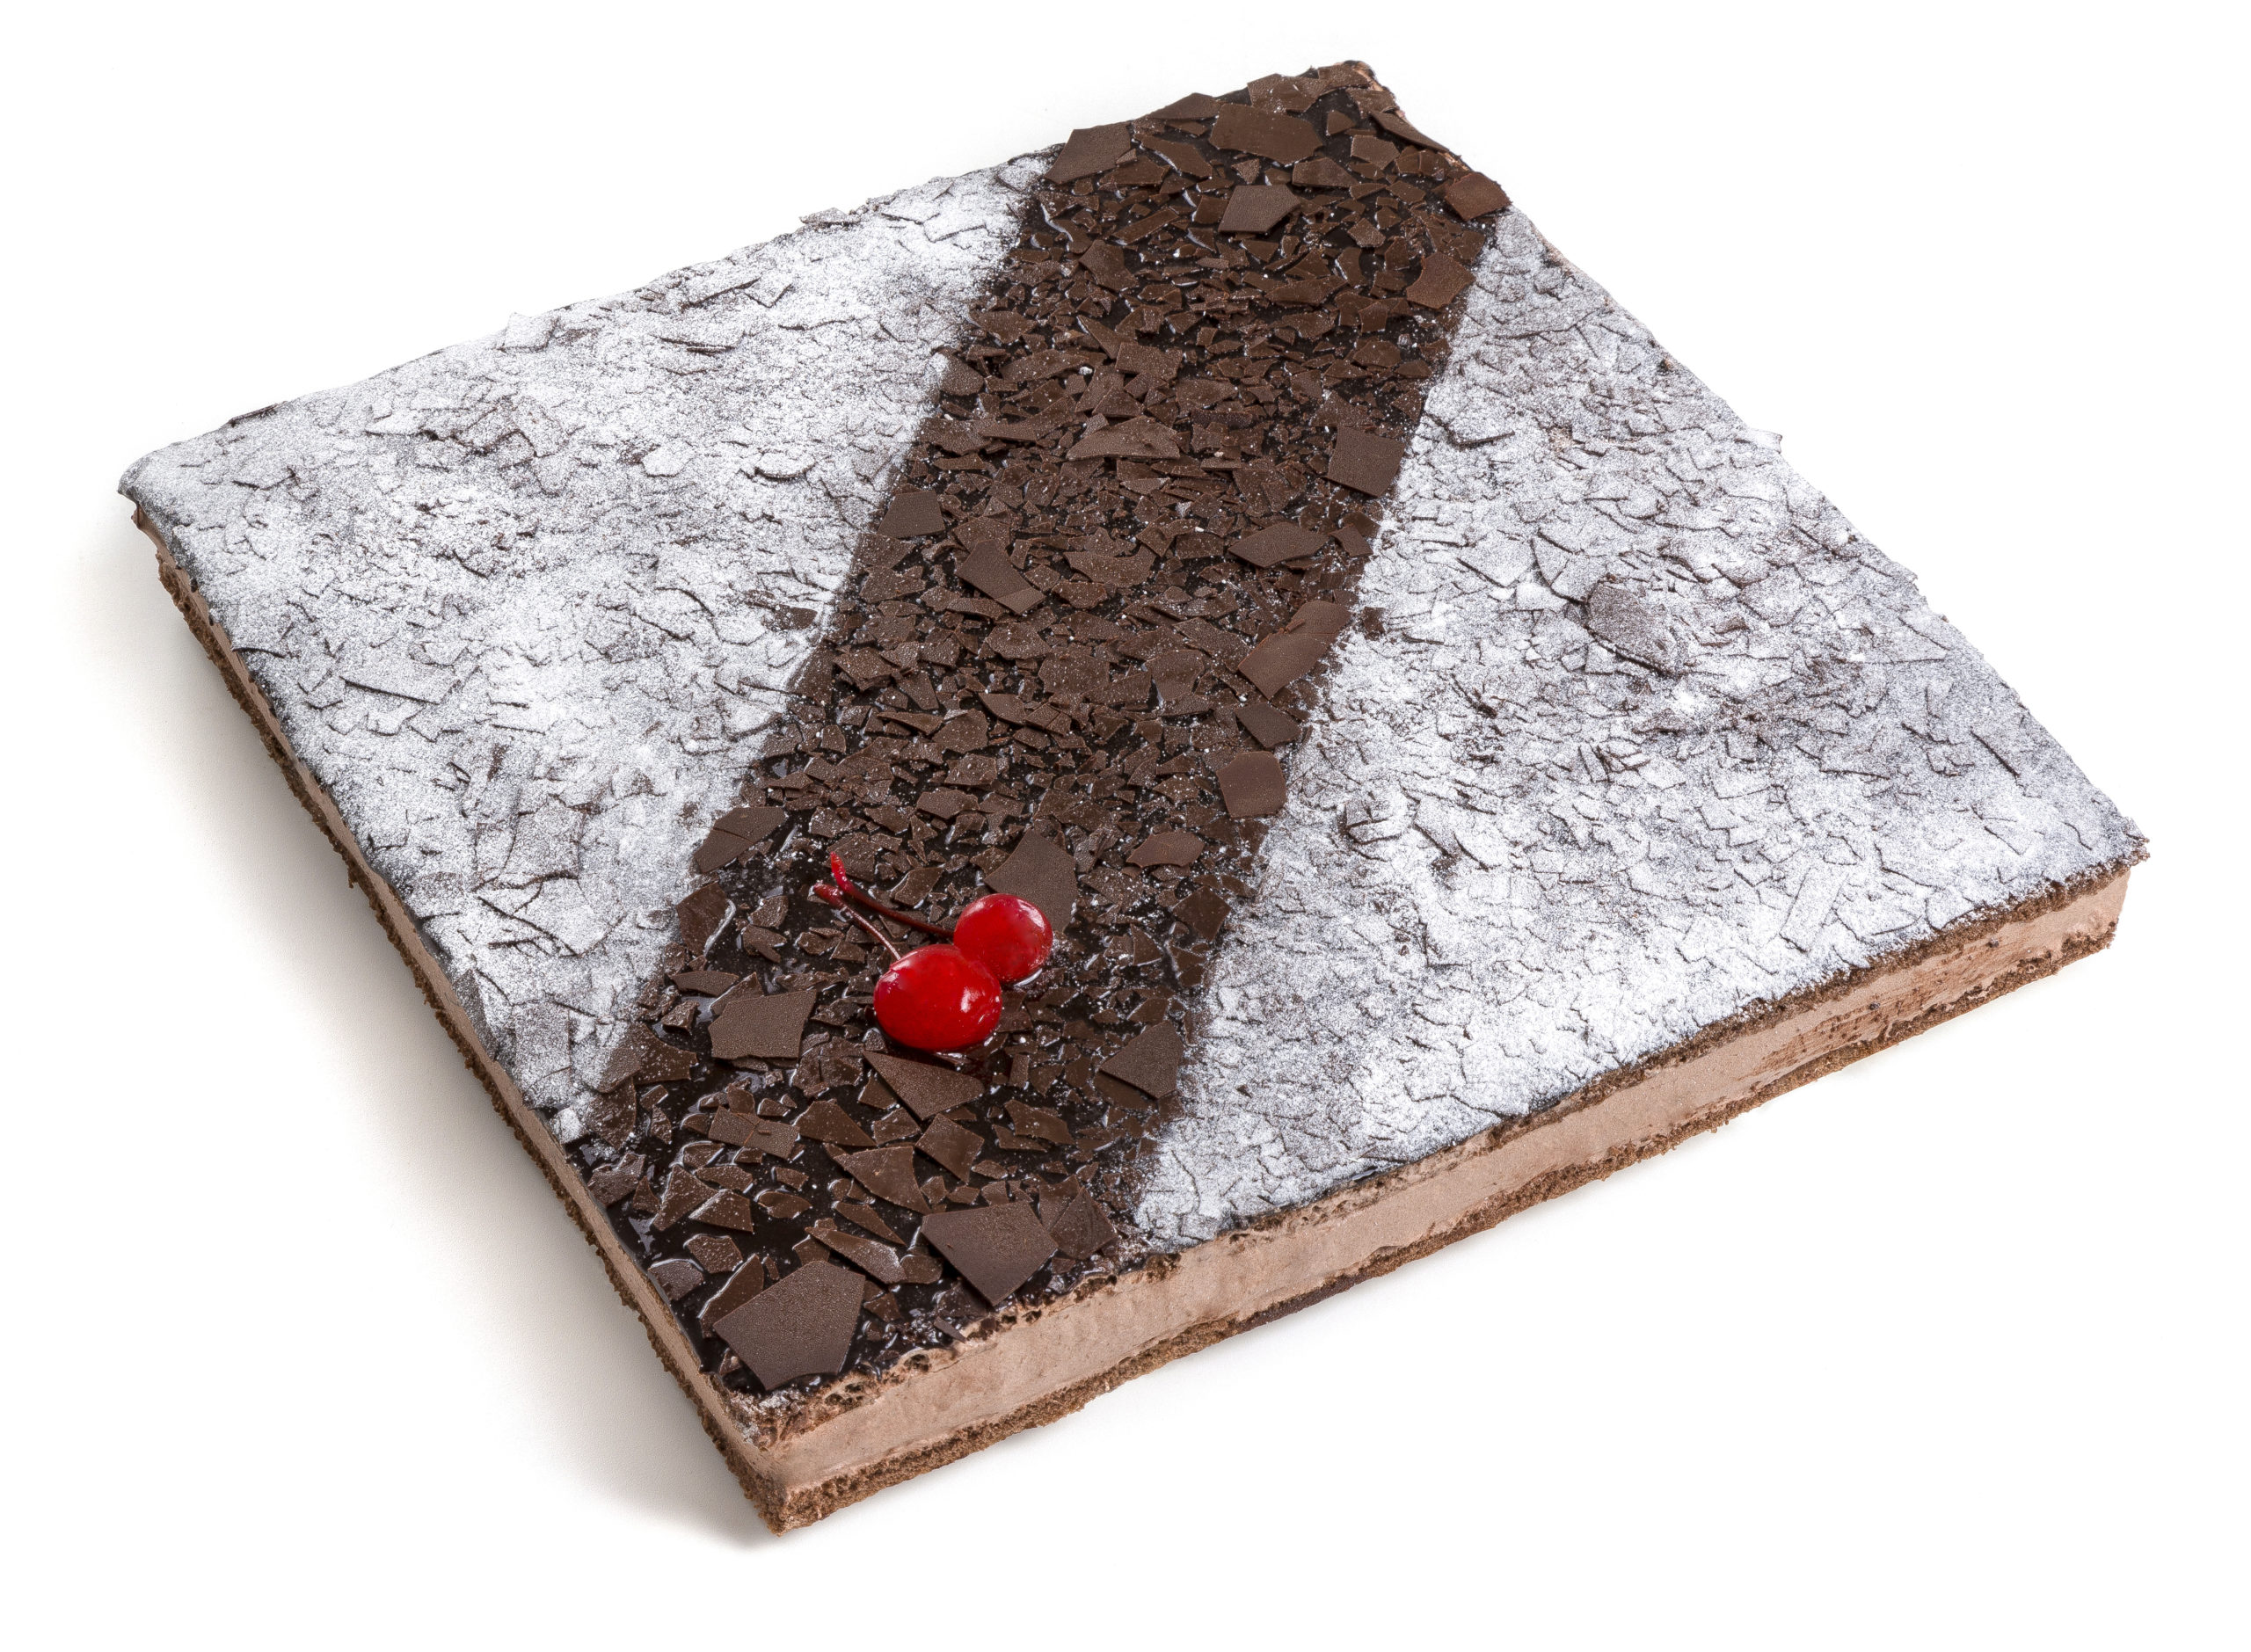 tarta selva negra pastisfred